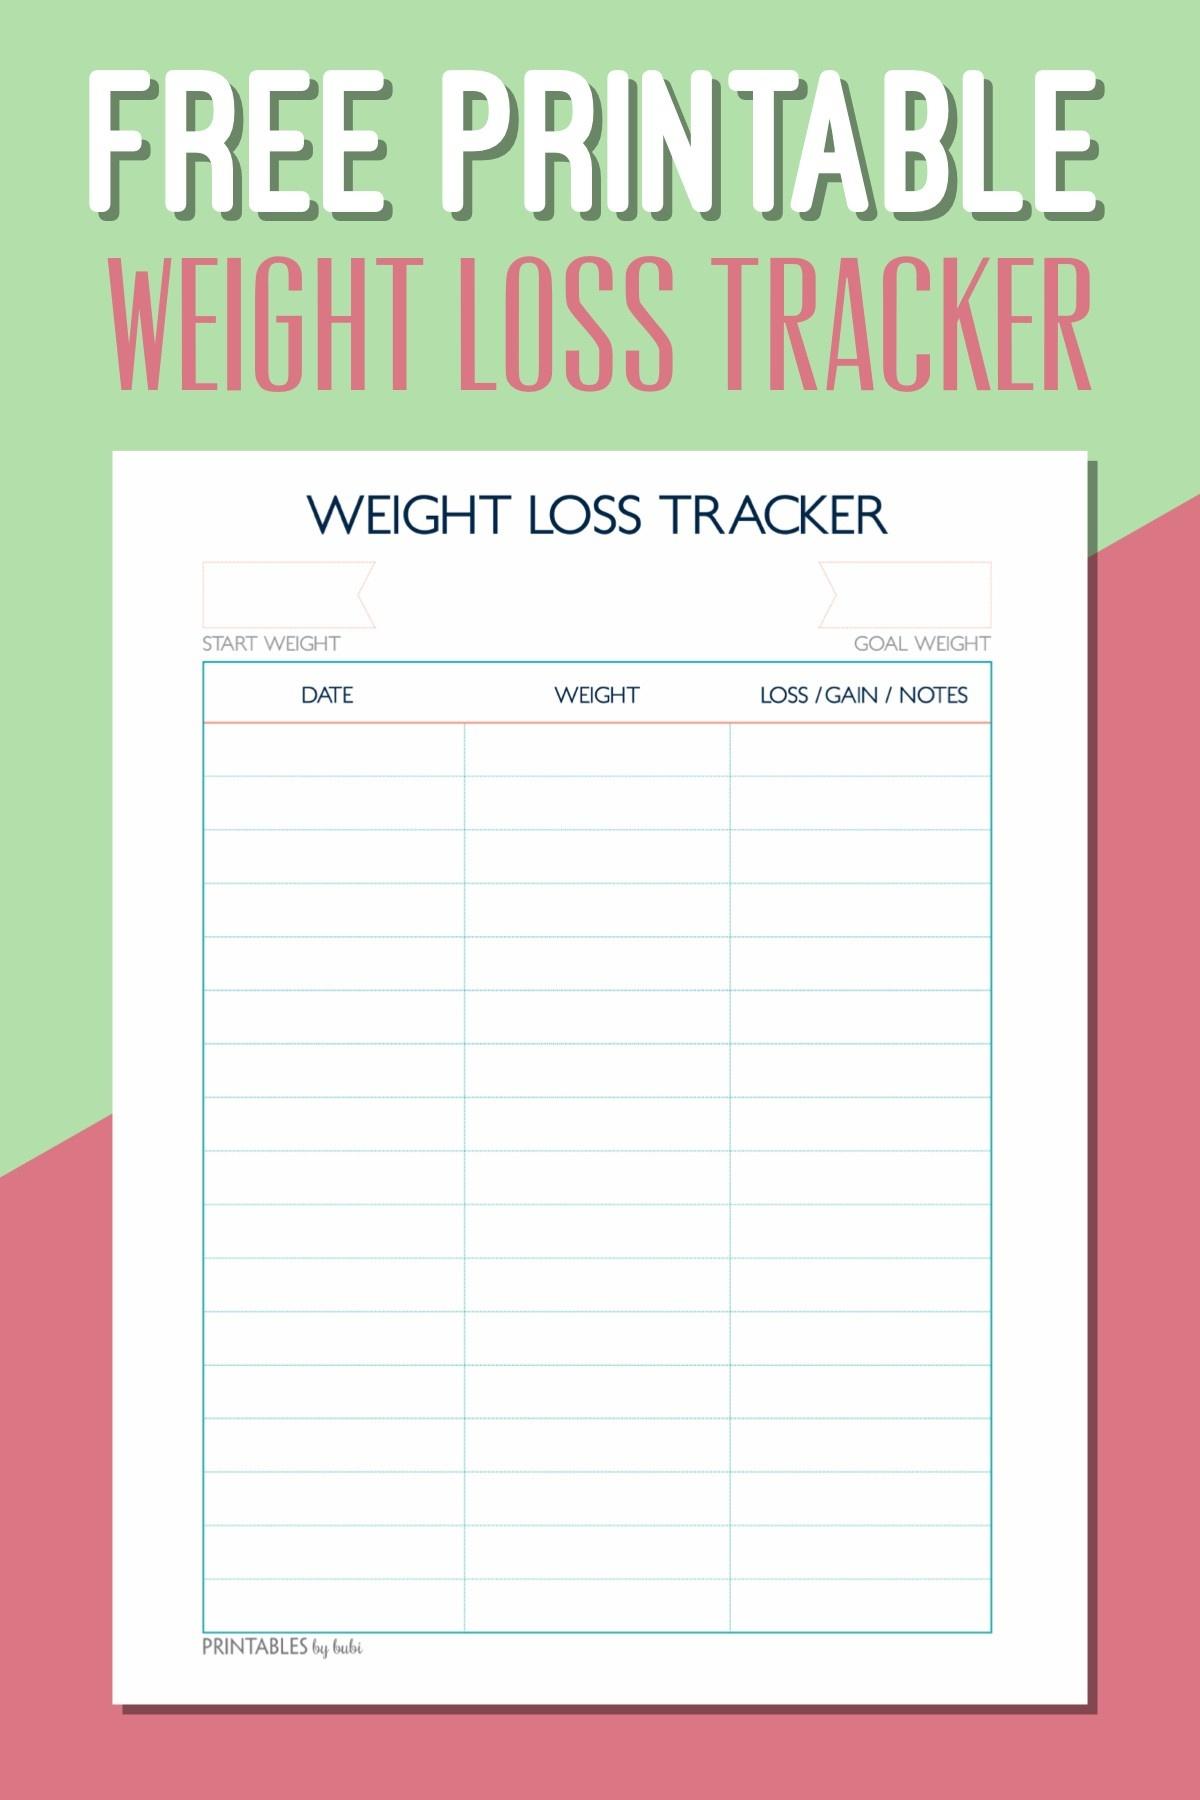 New Weight Loss Graph Chart | Mavensocial.co - Free Printable Weight Loss Graph Chart